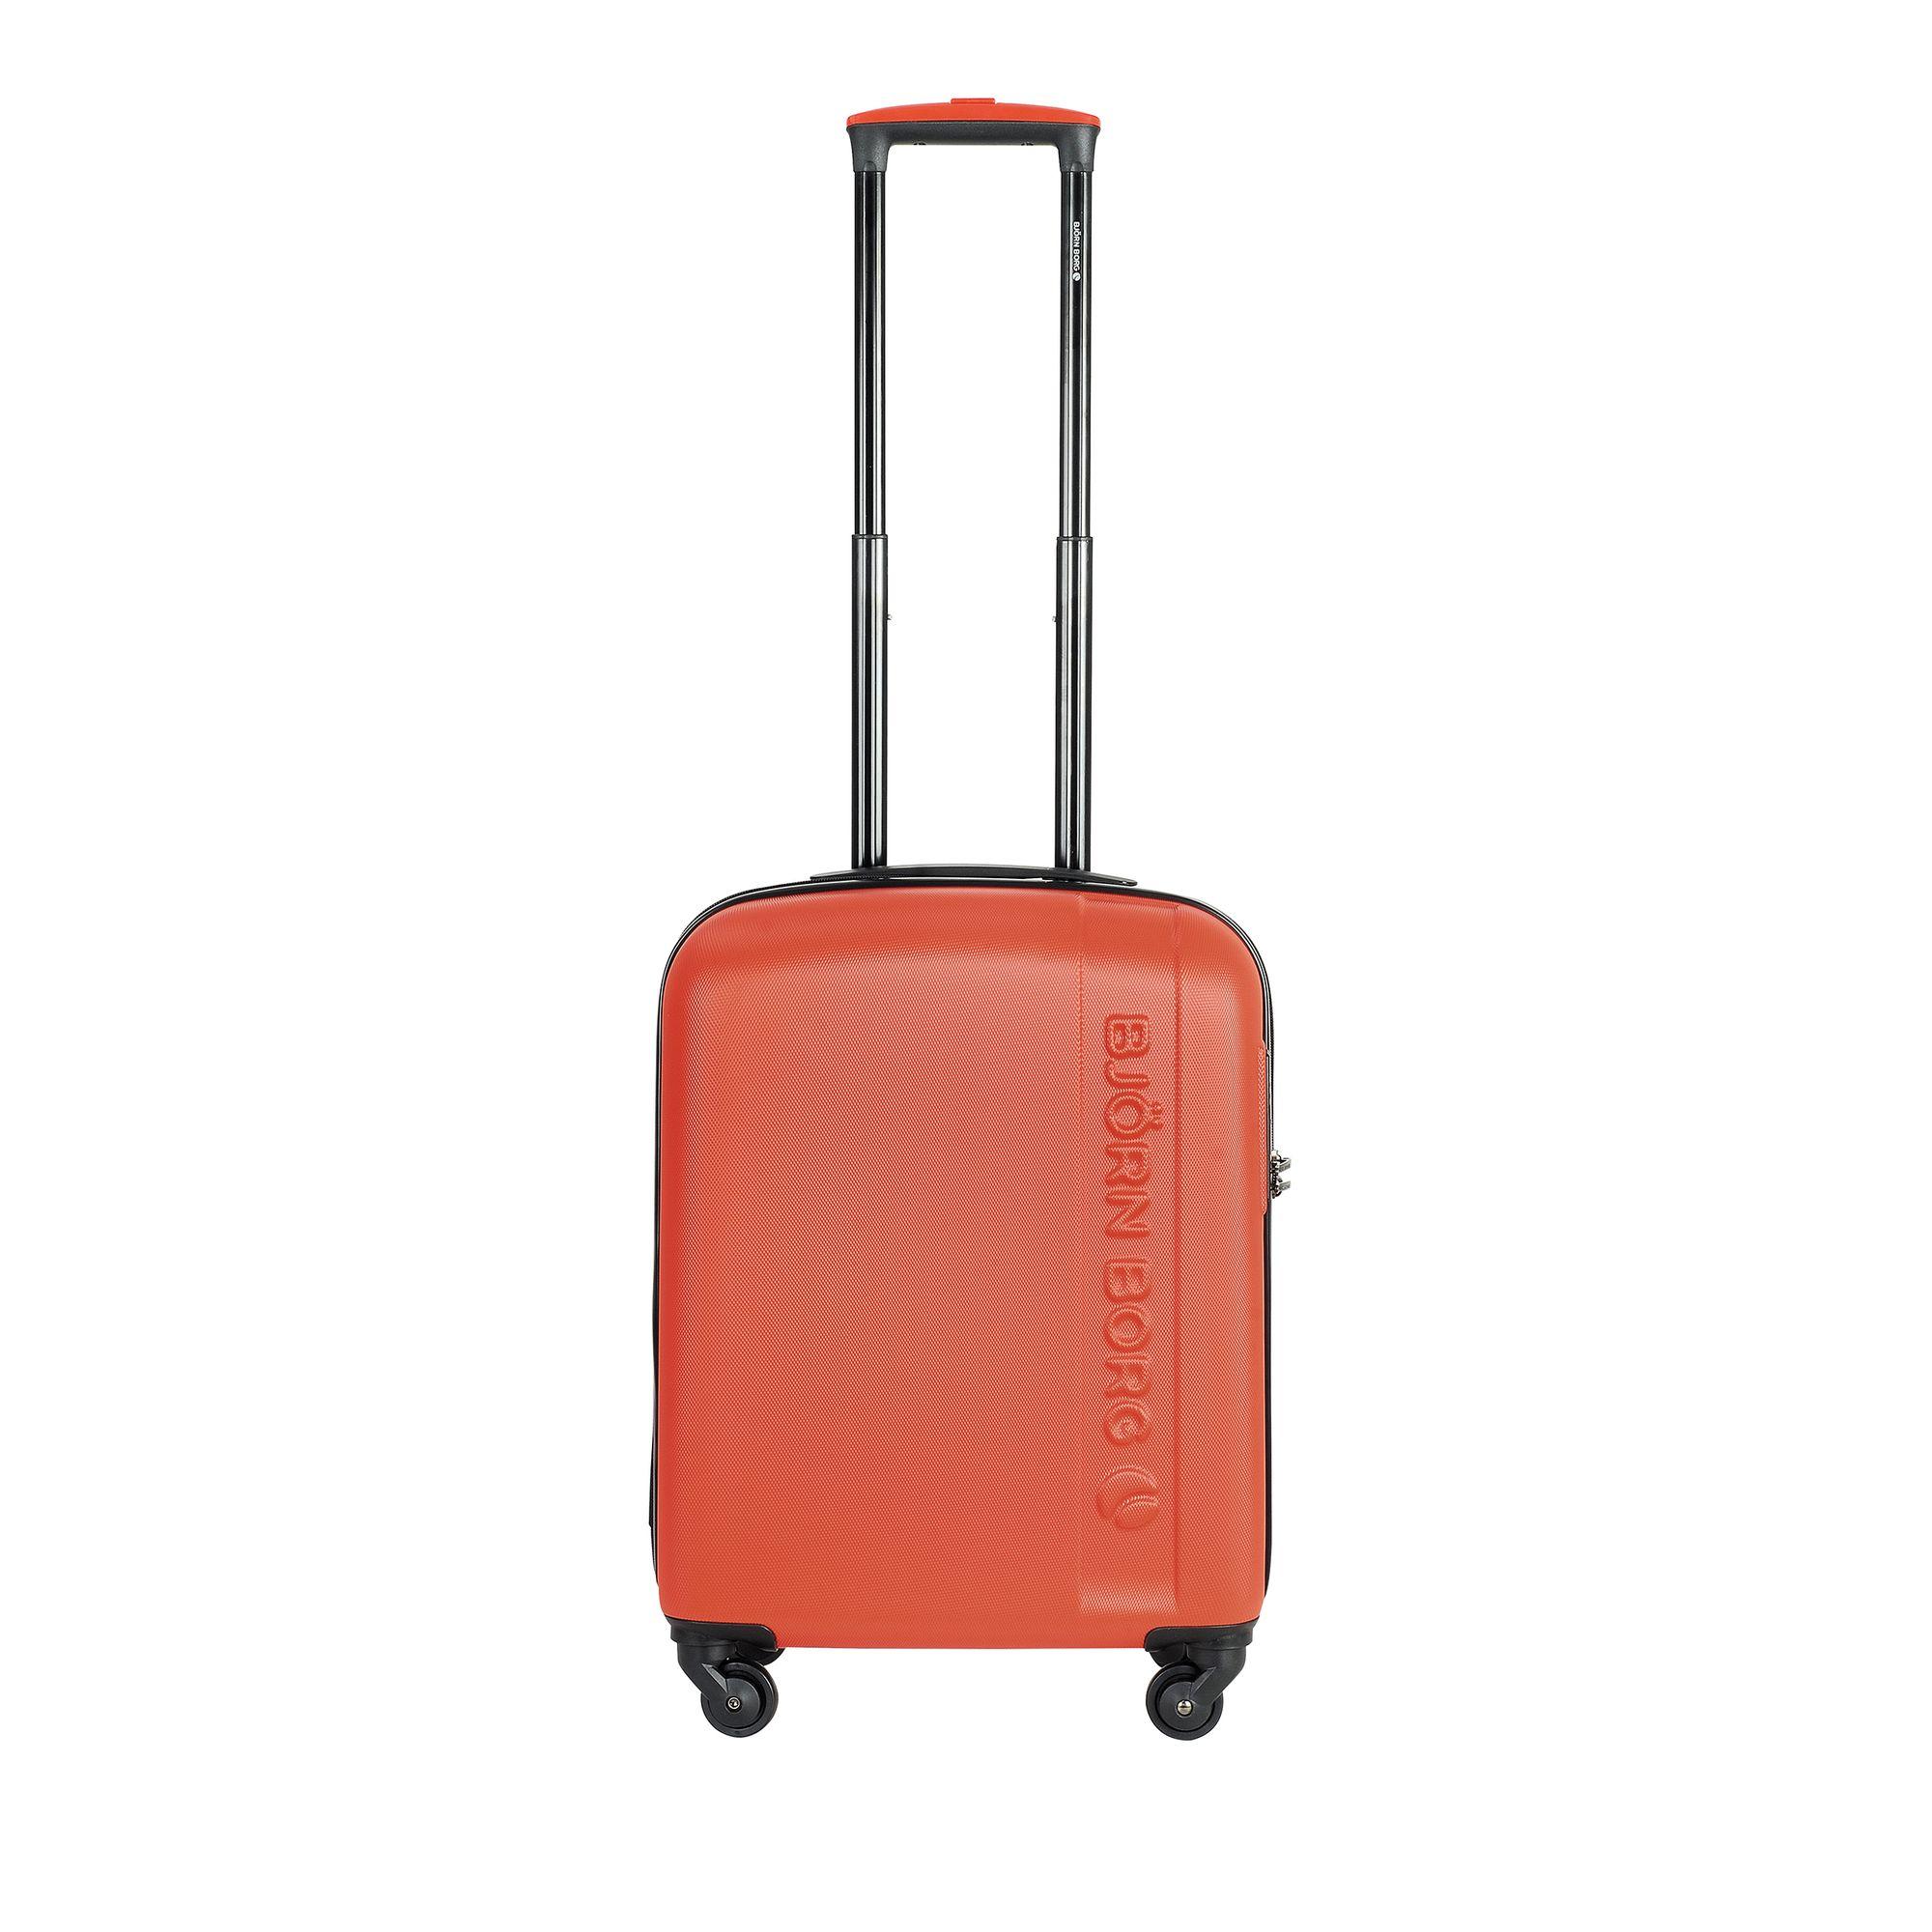 Björn Borg Hot Solid resväska, 4 hjul, 55/65/78 cm, Orange, 55cm